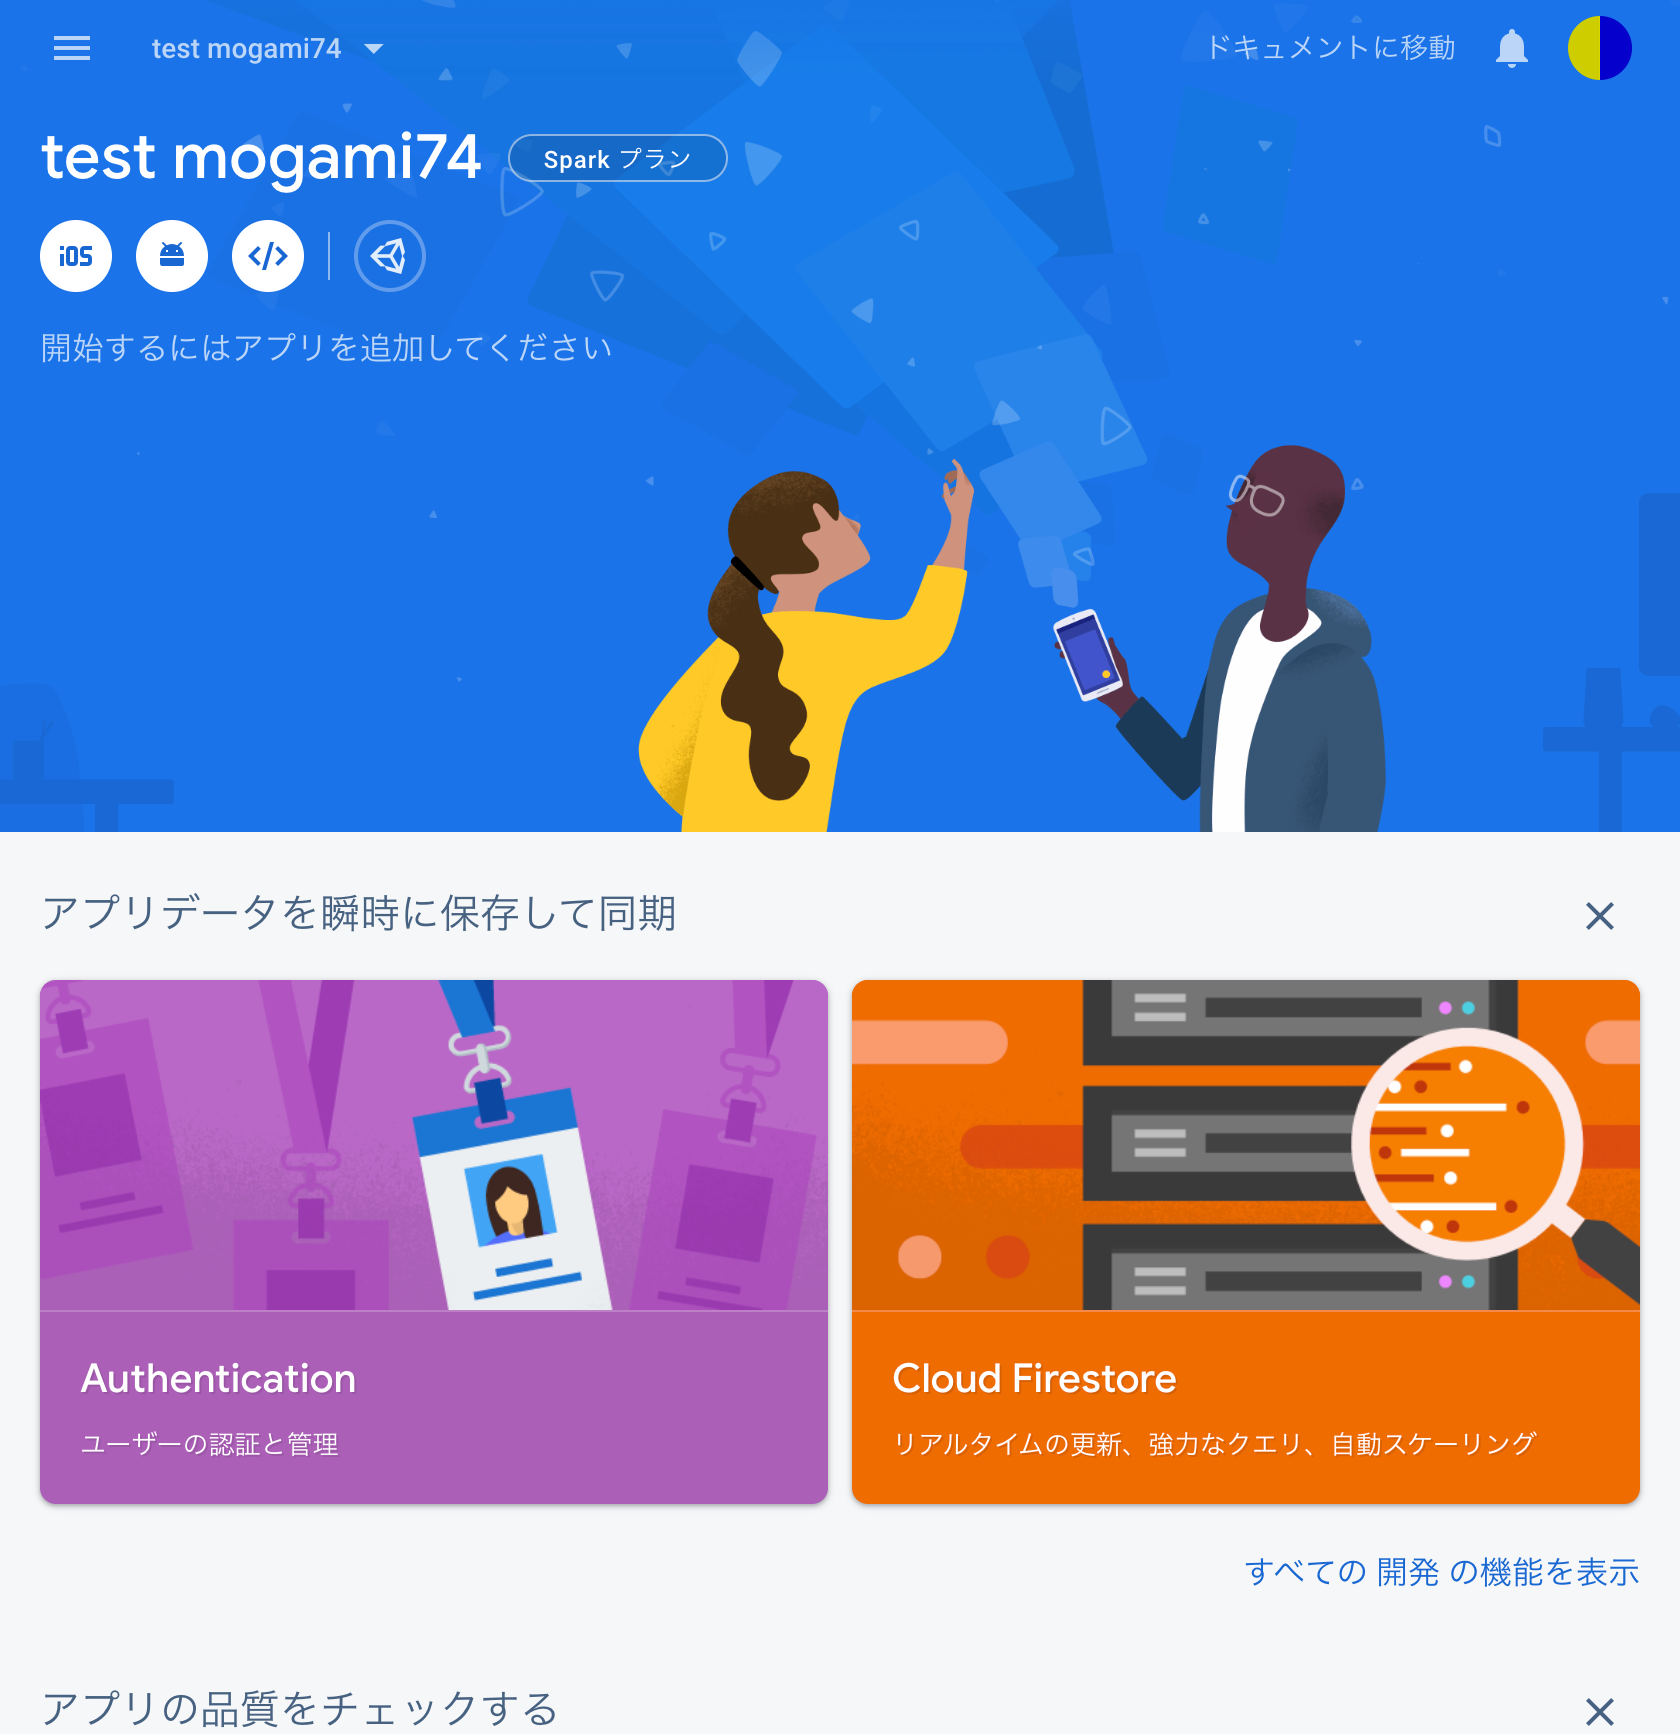 f:id:mogami74:20191207203237p:plain